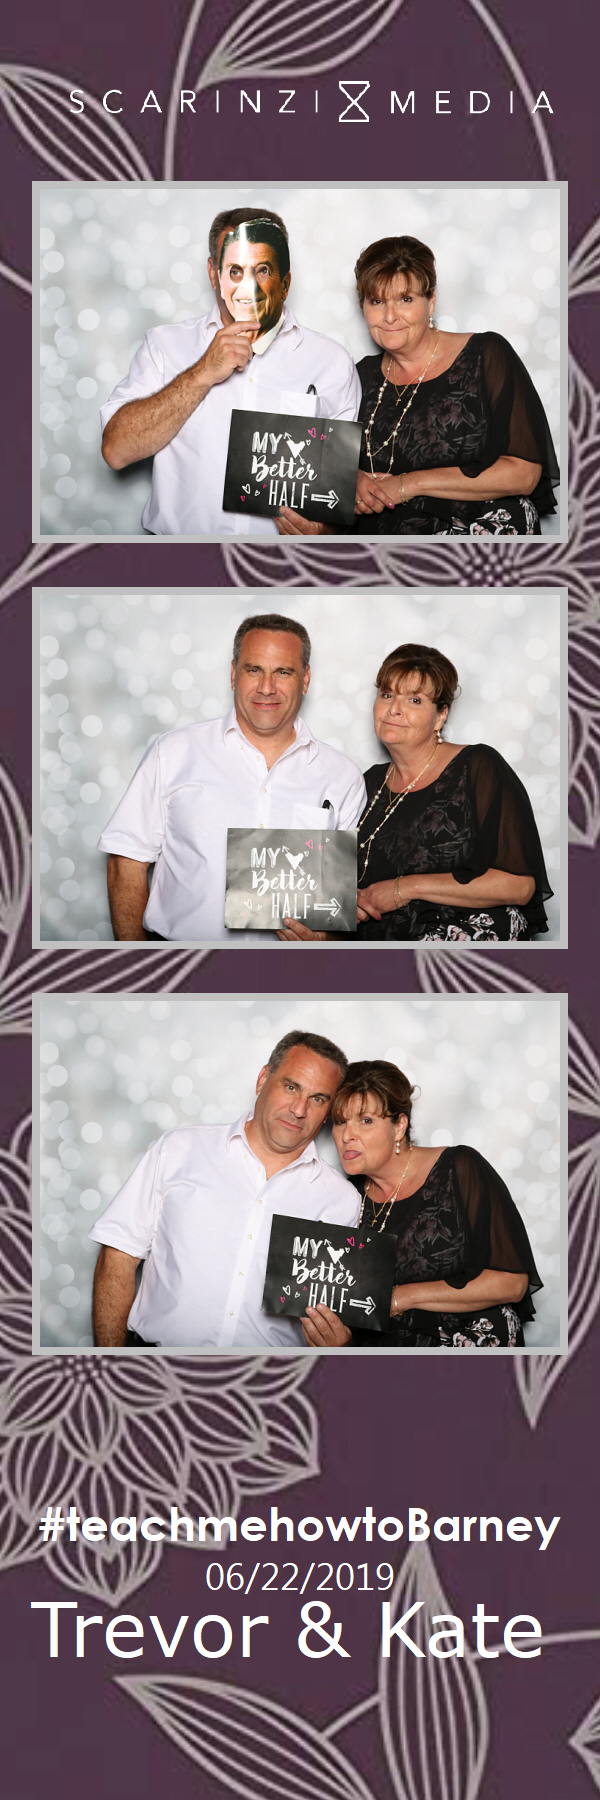 2019.06.22 - Barney Wedding PHOTOBOOTH51.jpg